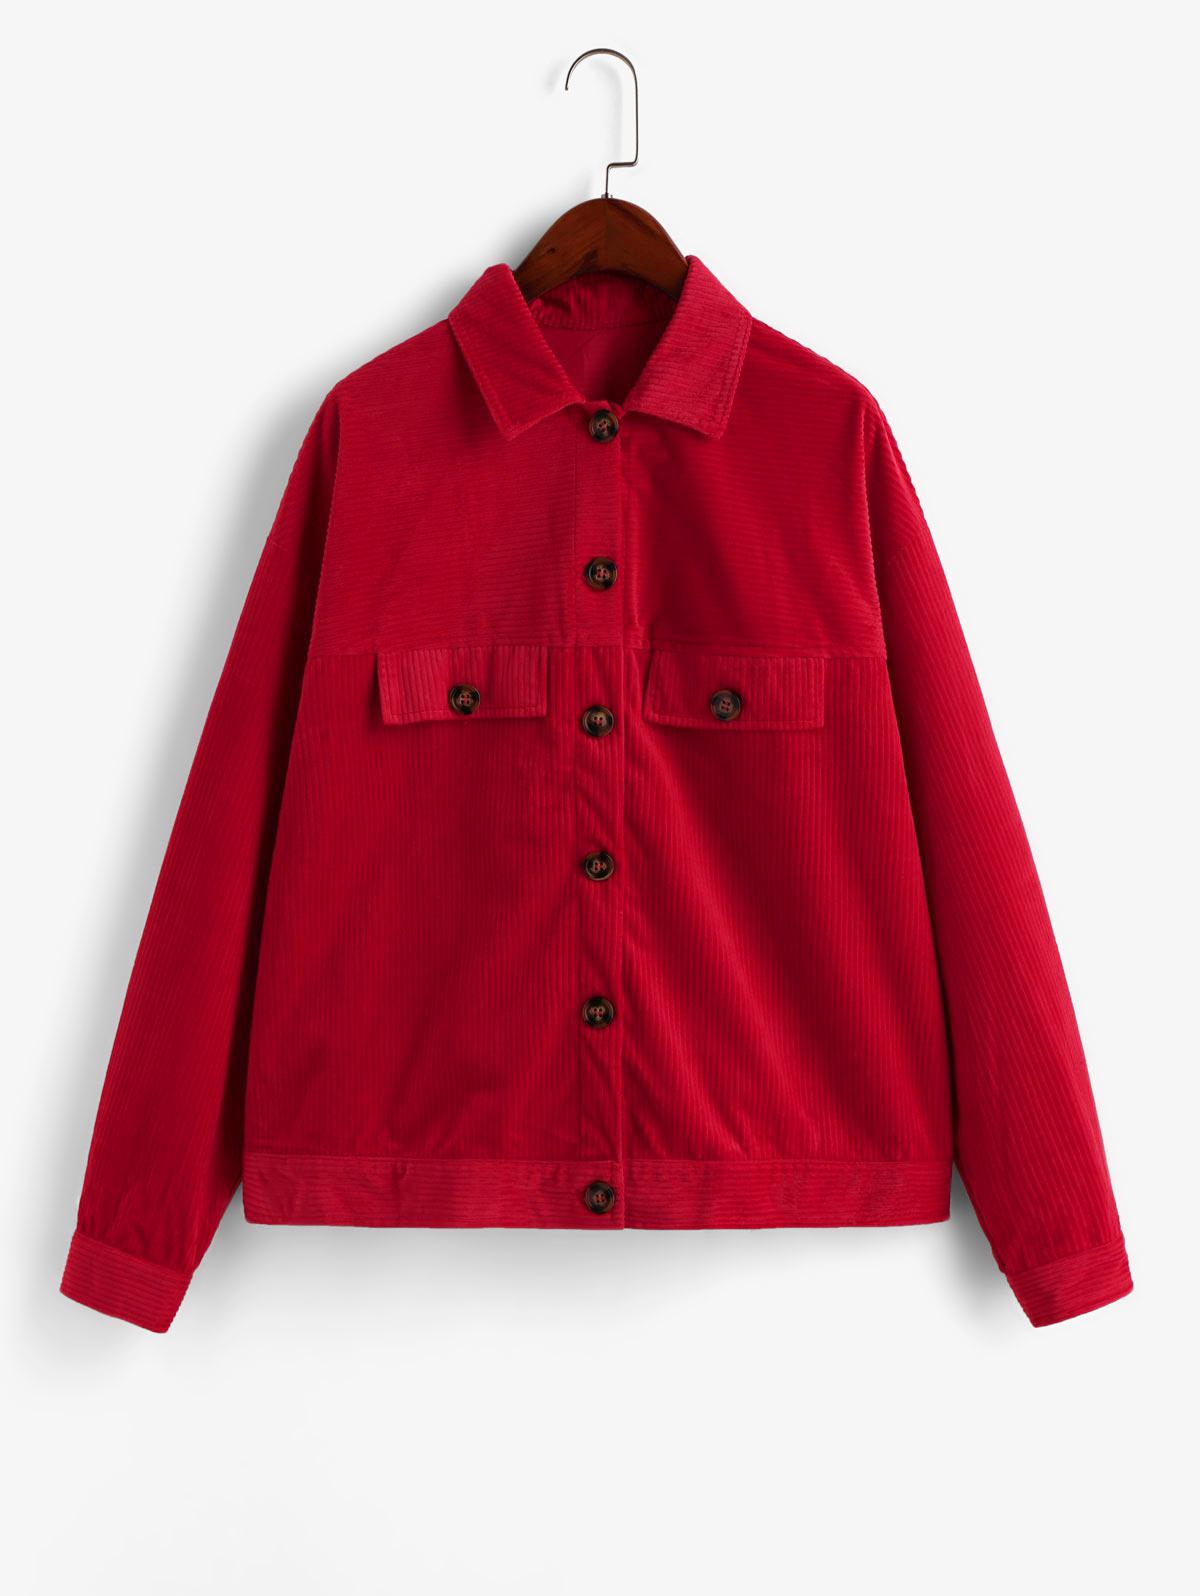 ZAFUL Button Front Faux Pockets Corduroy Shirt Jacket